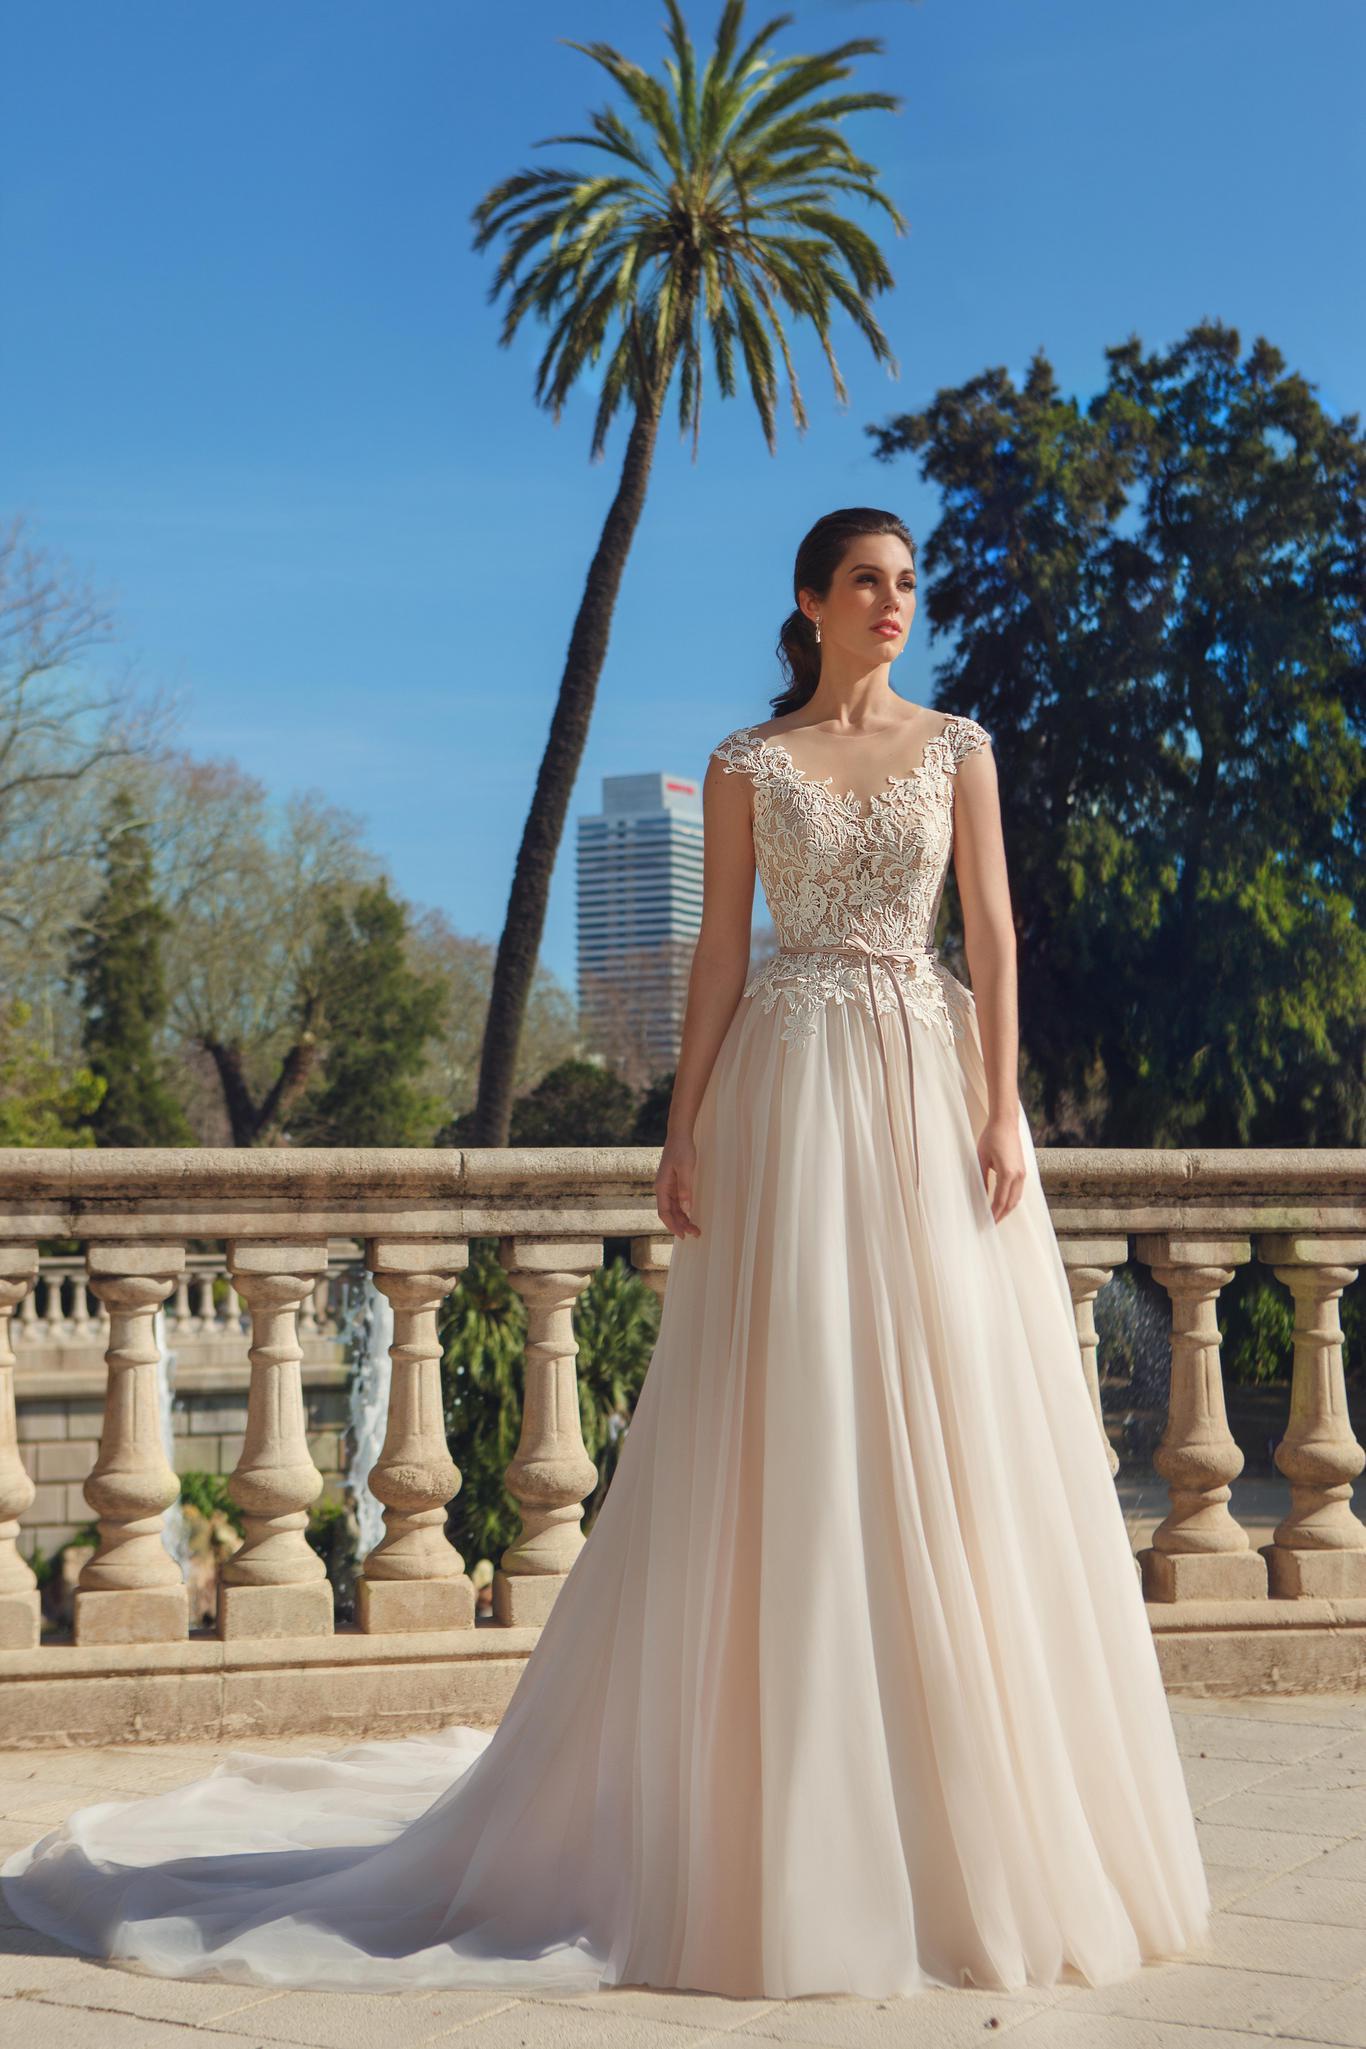 Силуэт свадебного платья - принцесса